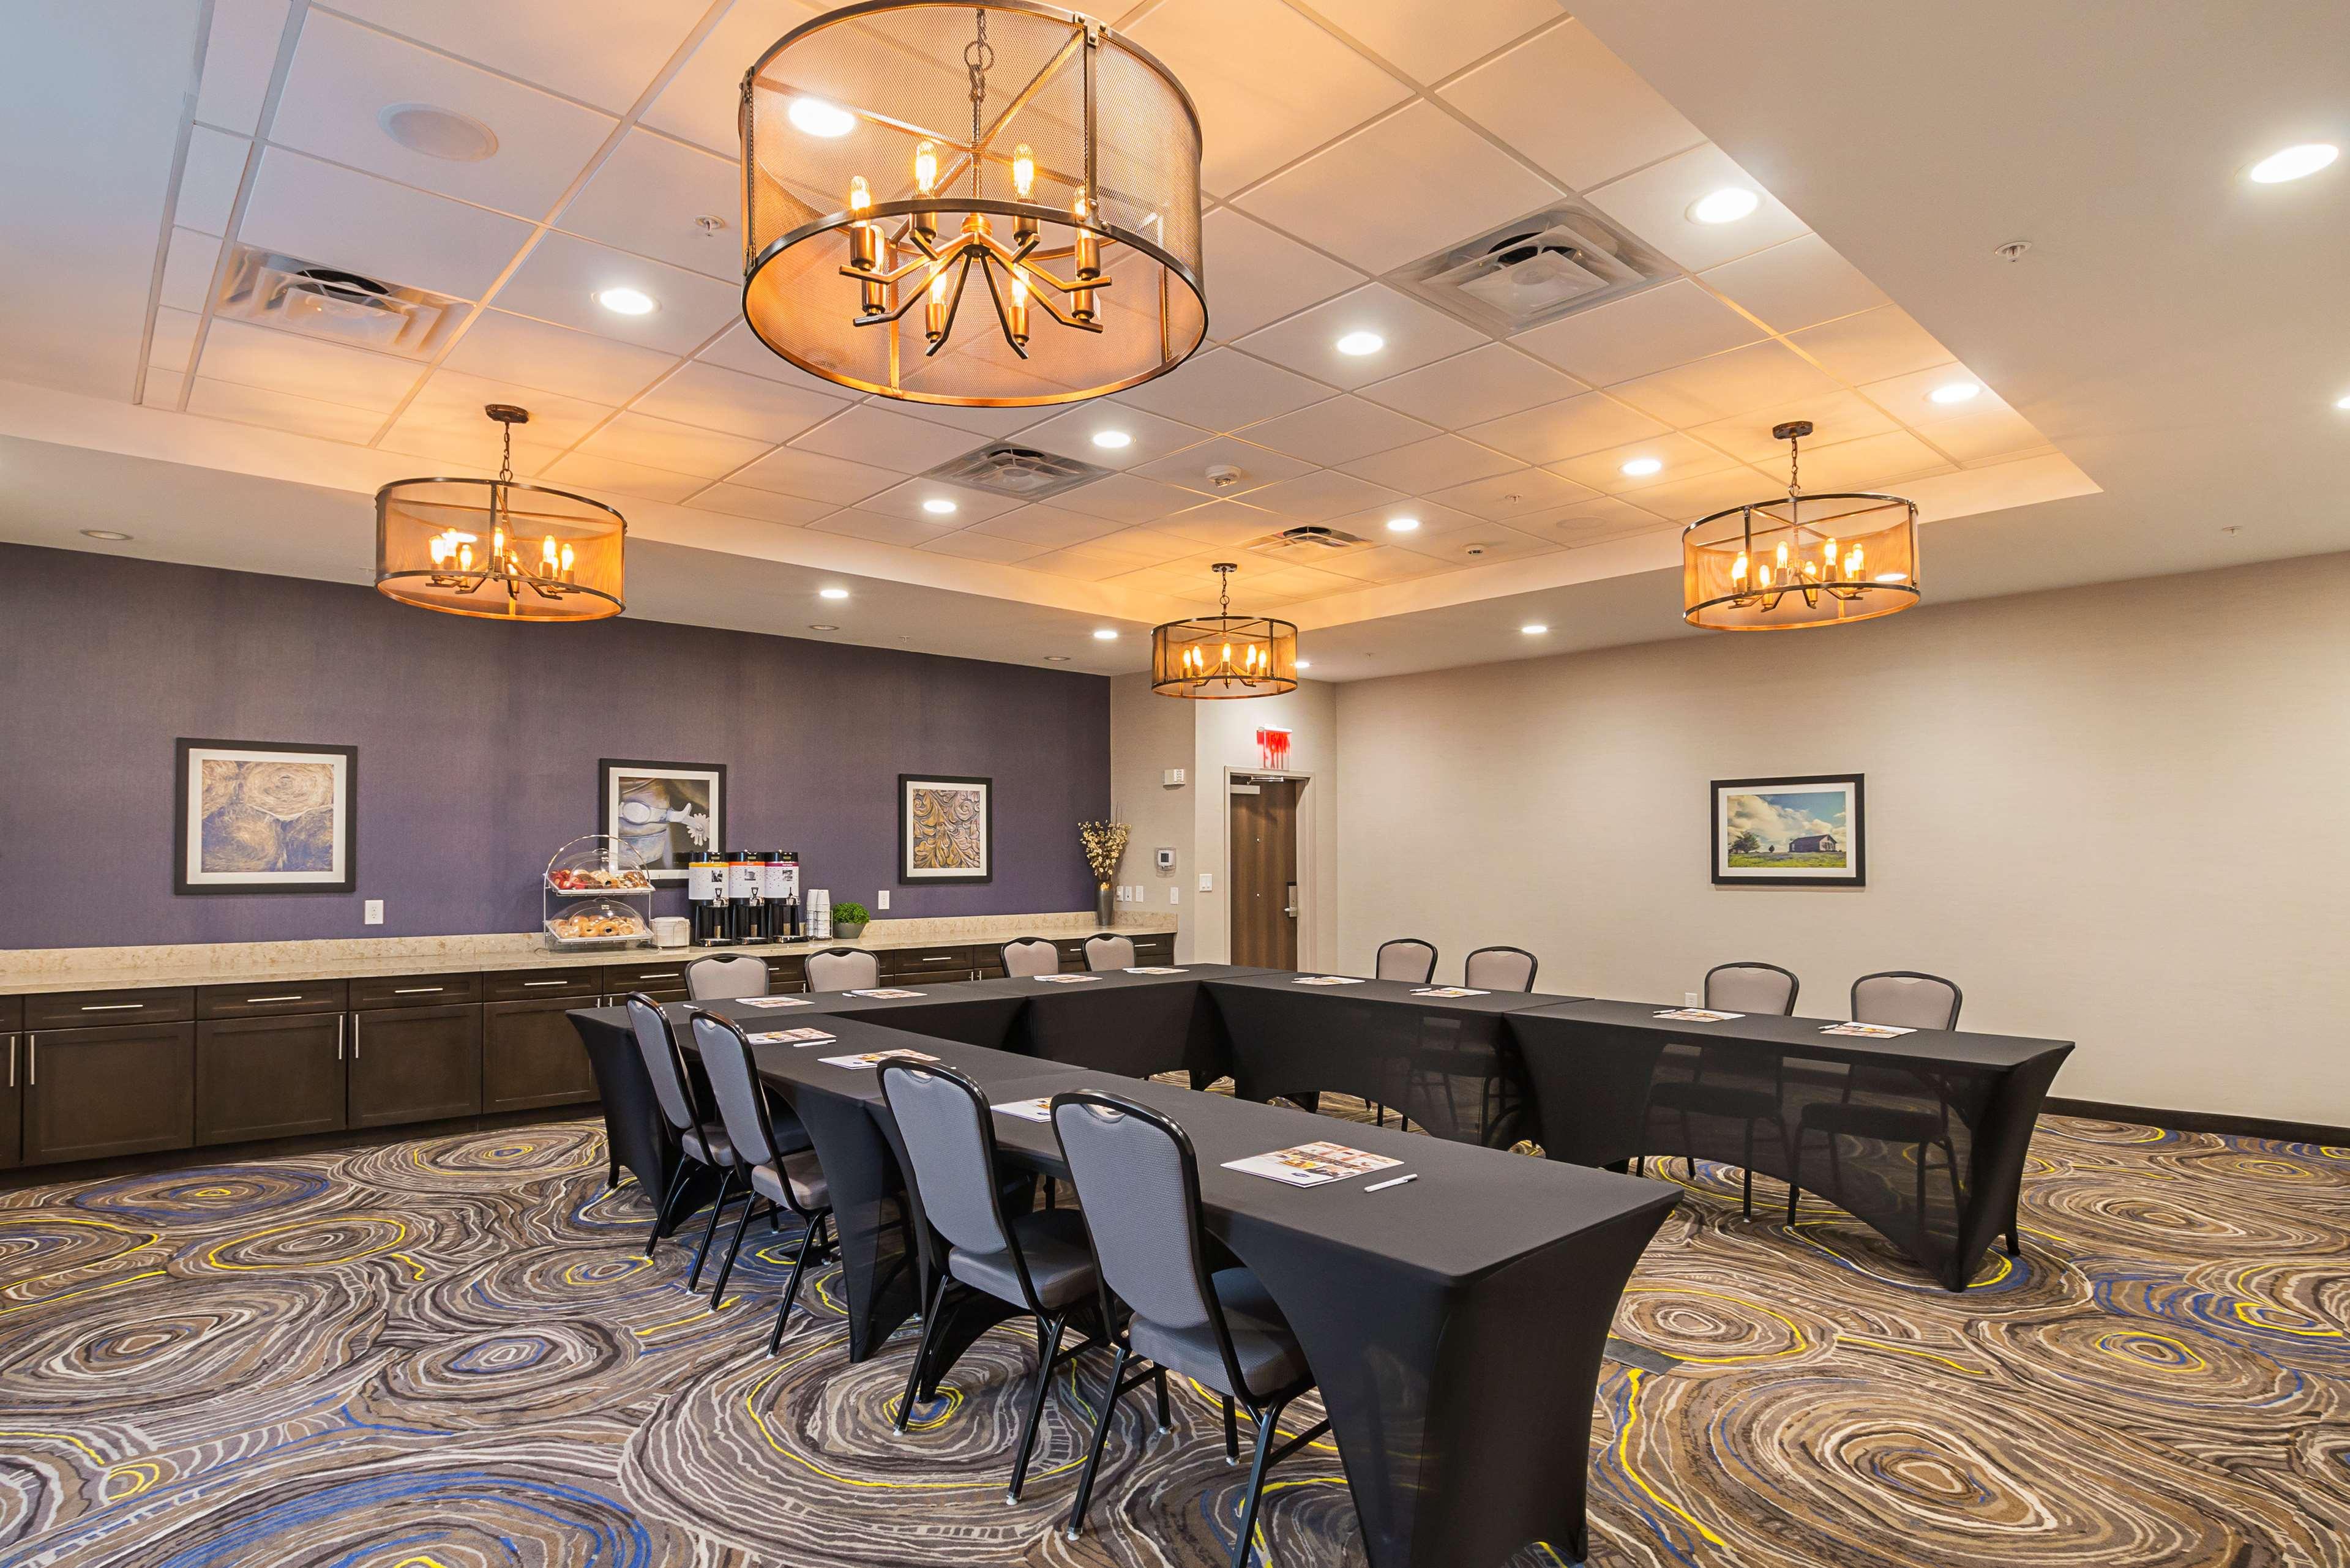 Hampton Inn & Suites Colleyville DFW West image 49